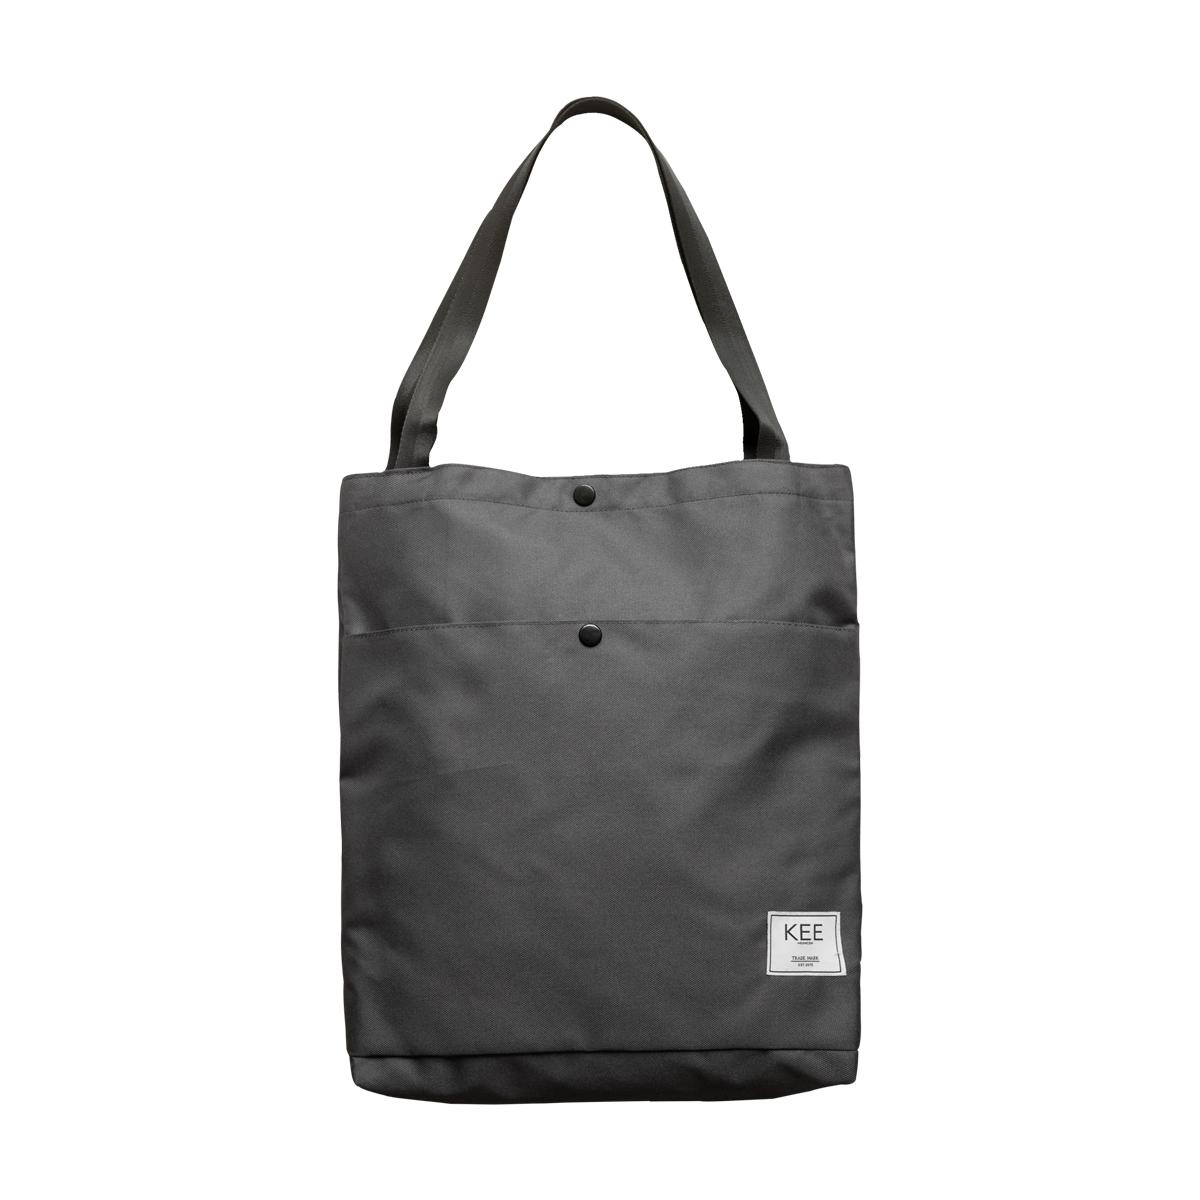 kee tas totebag lila edition dark grey tote bag premium